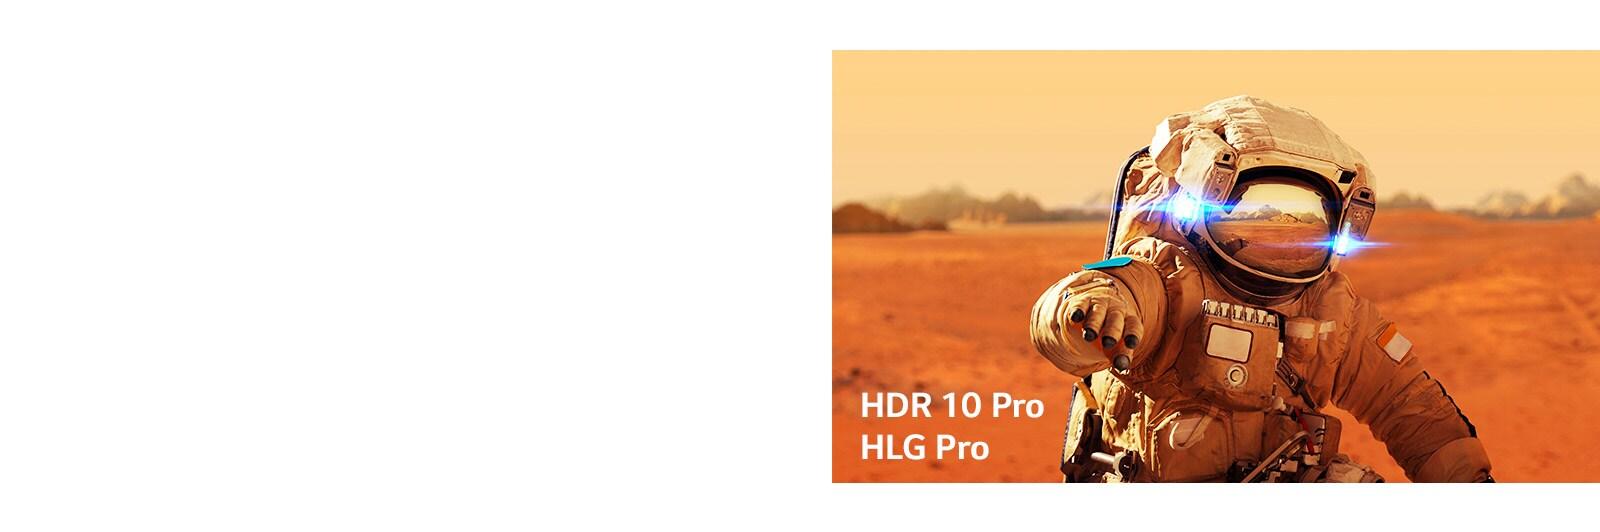 LG 65NANO80TNA HDR and HLG Pro